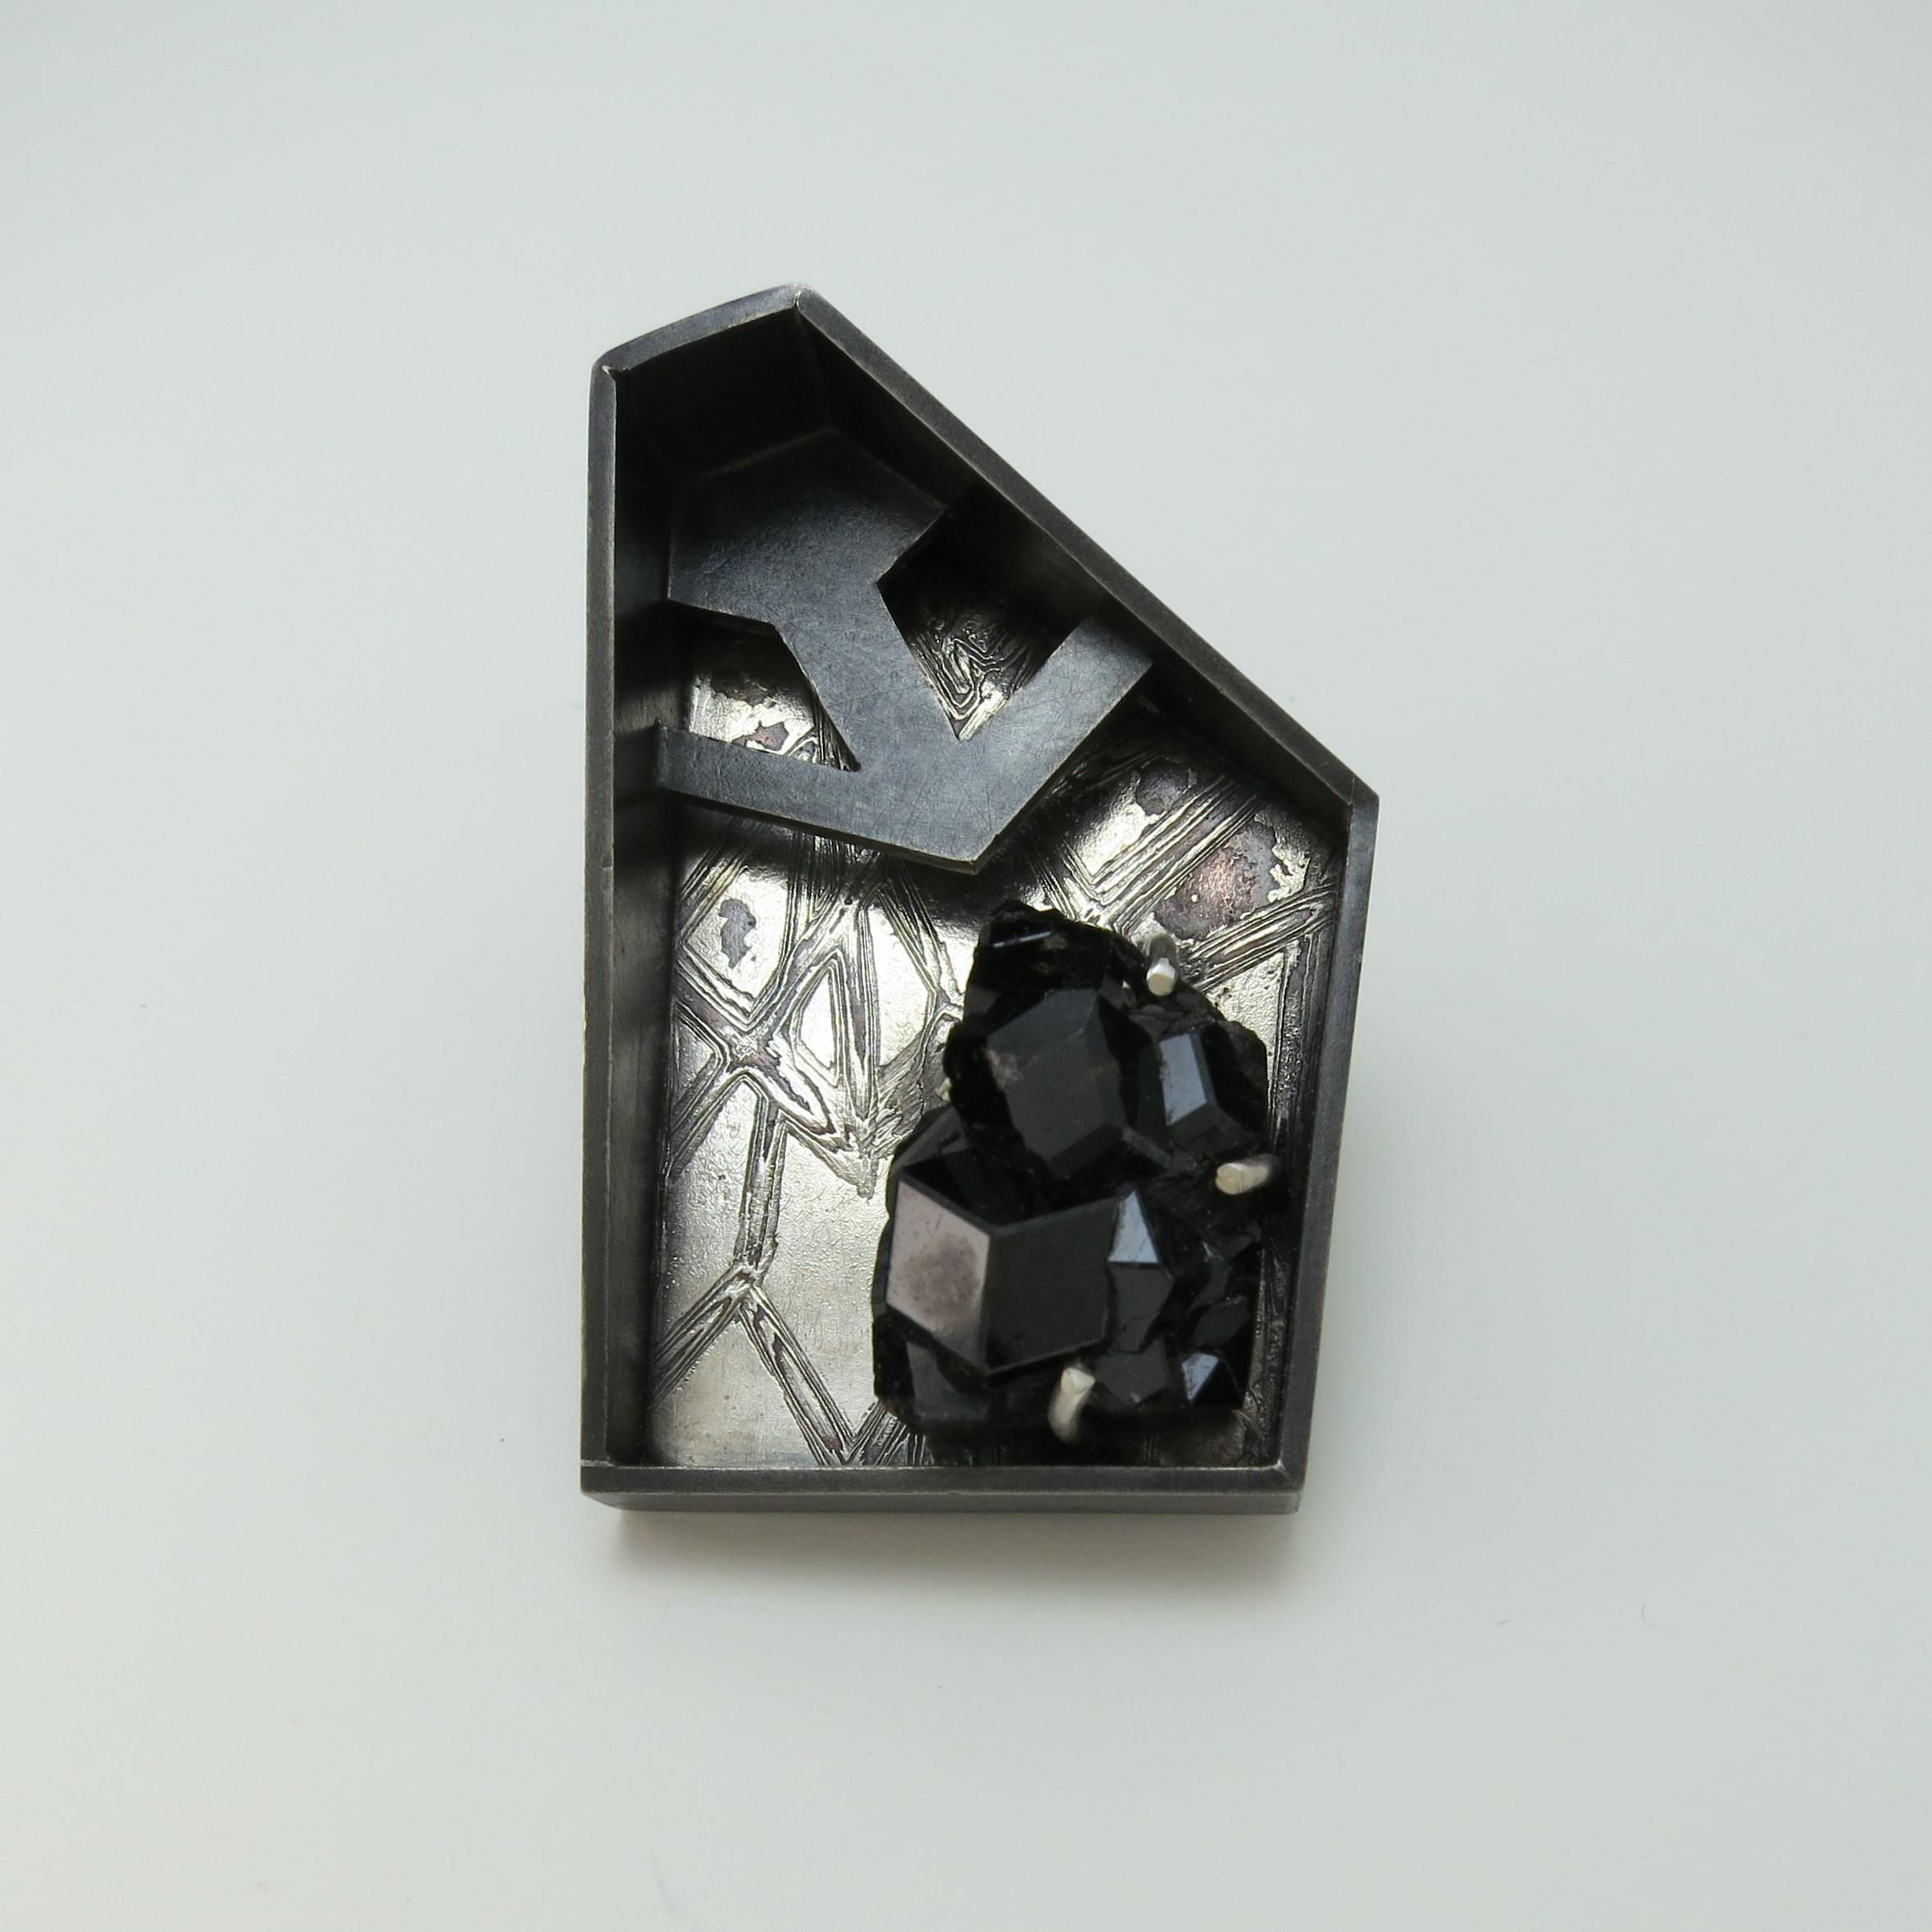 Contact.1 brooch-pendant